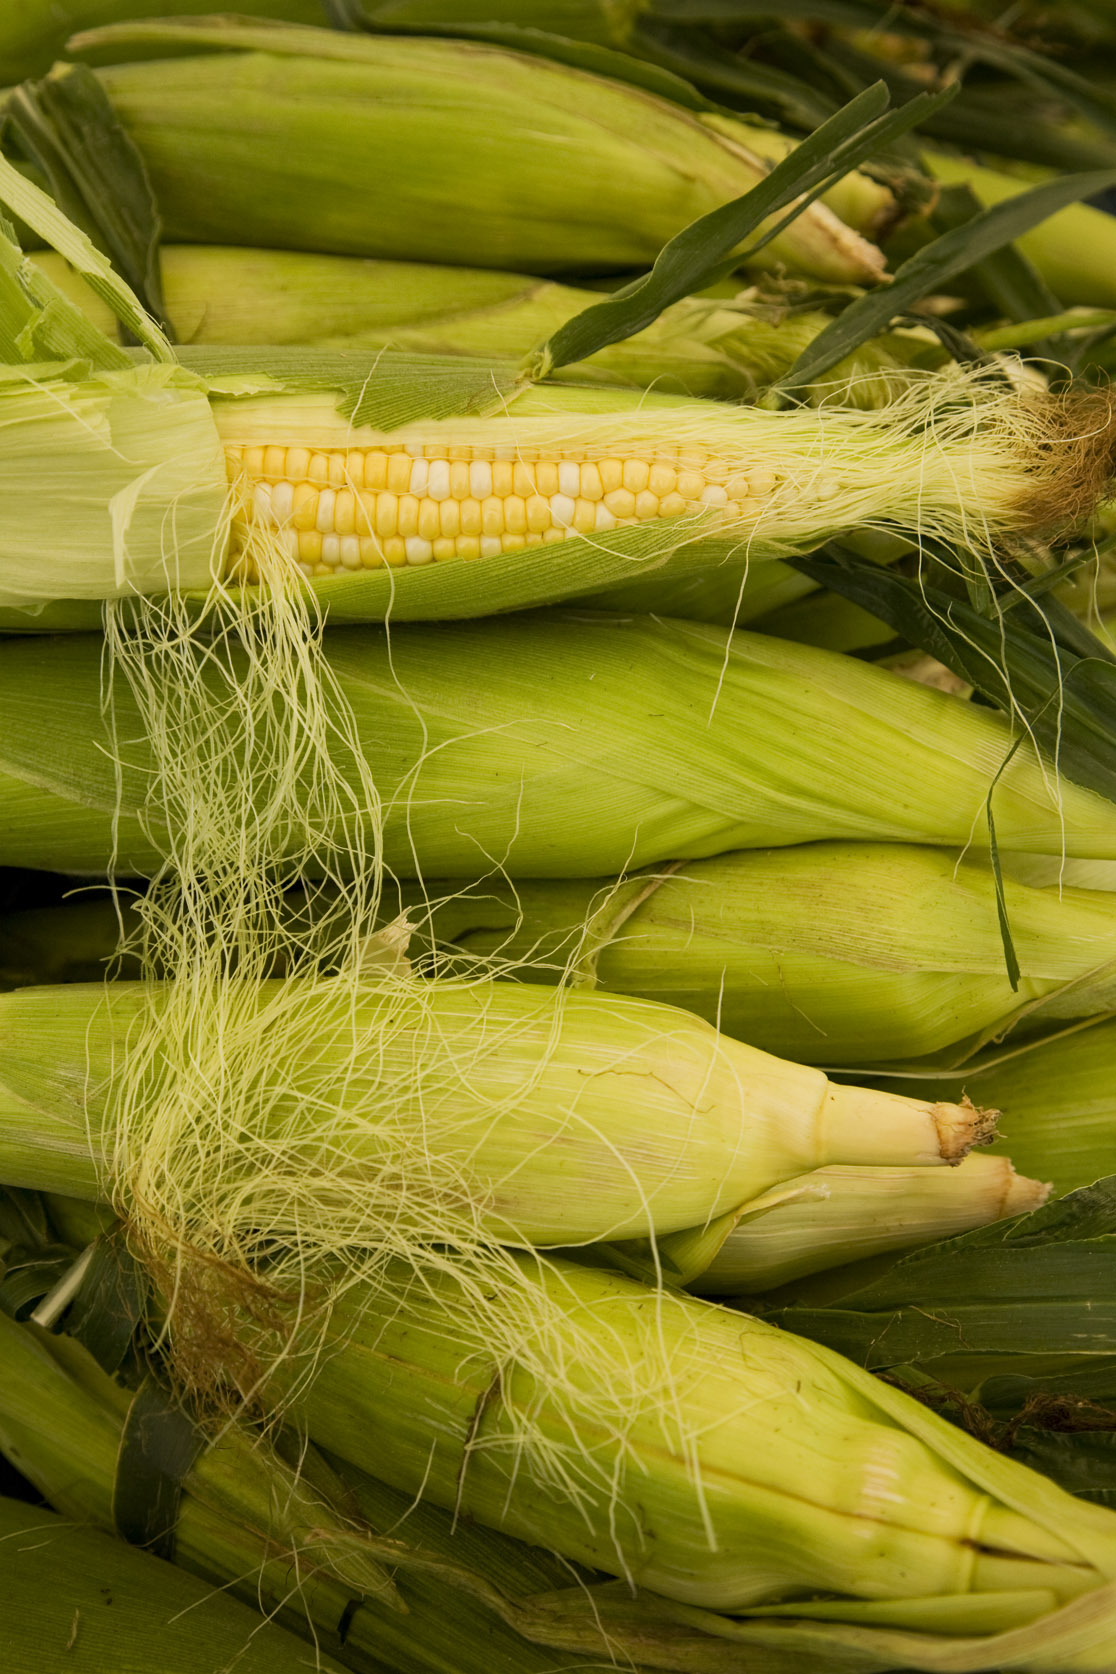 Littel Acres Farm Fruits and Vegetables